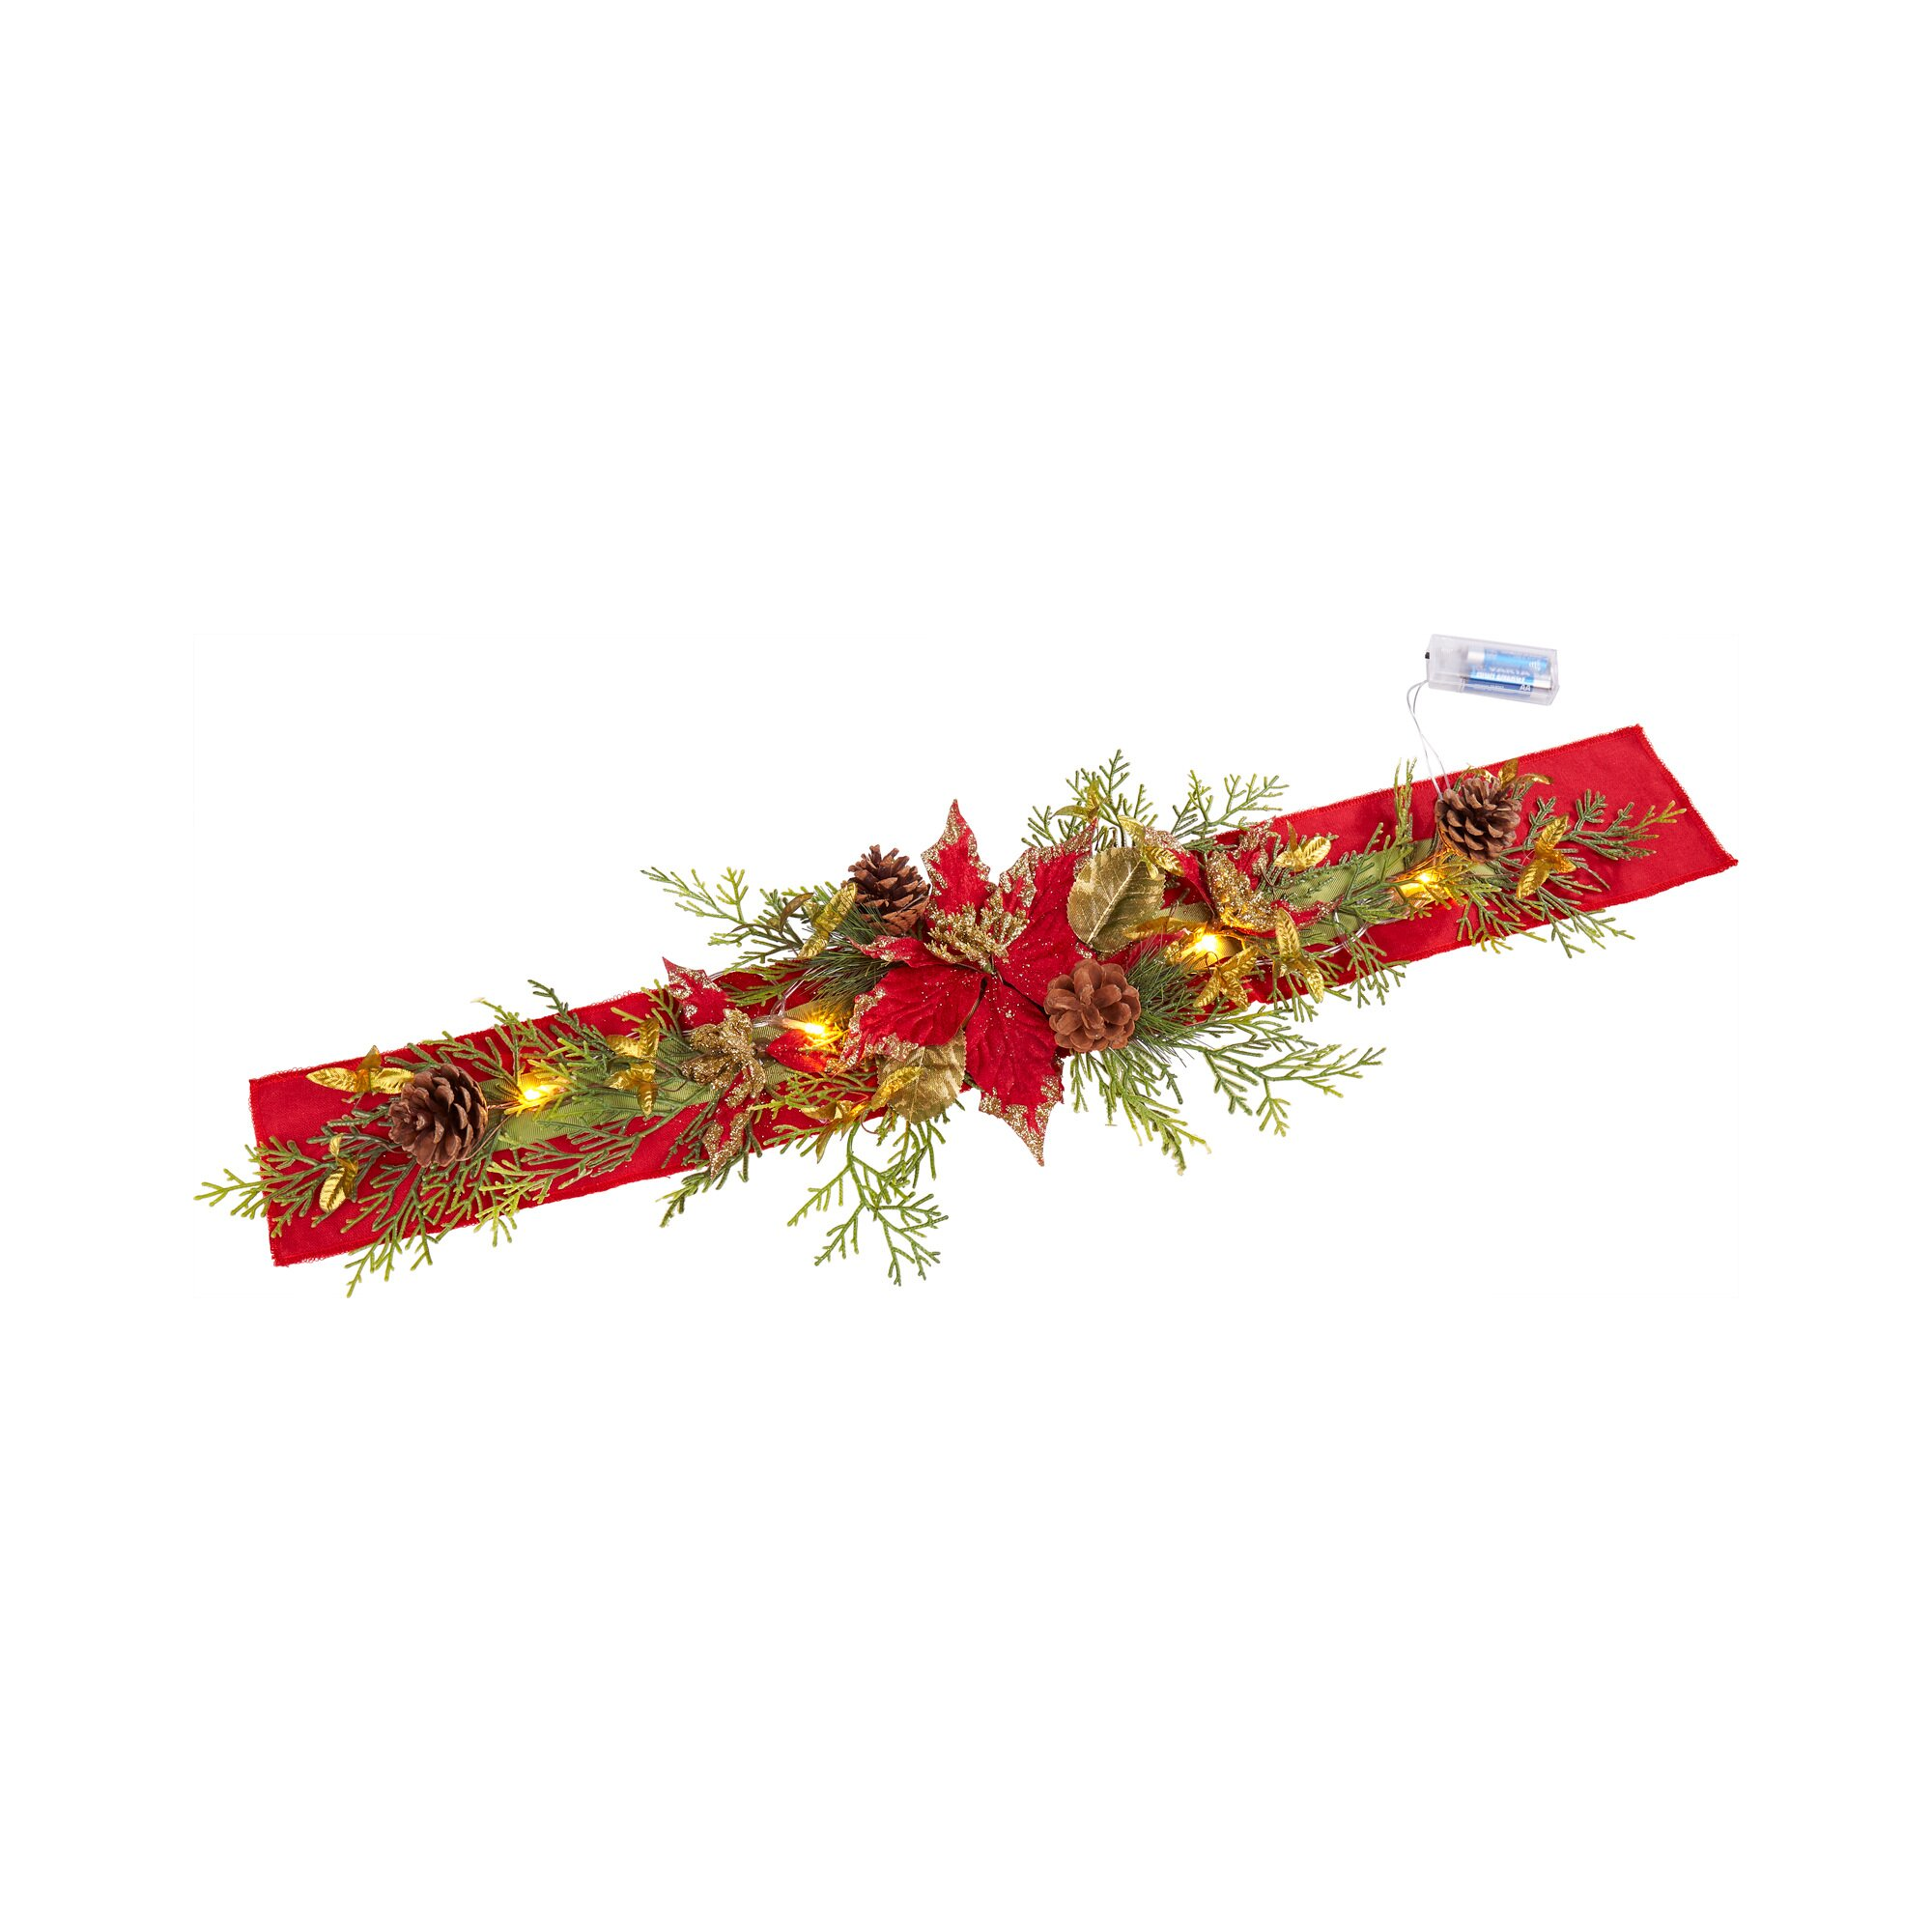 "Image of LED-Weihnachts-Läufer ""Christstern"""